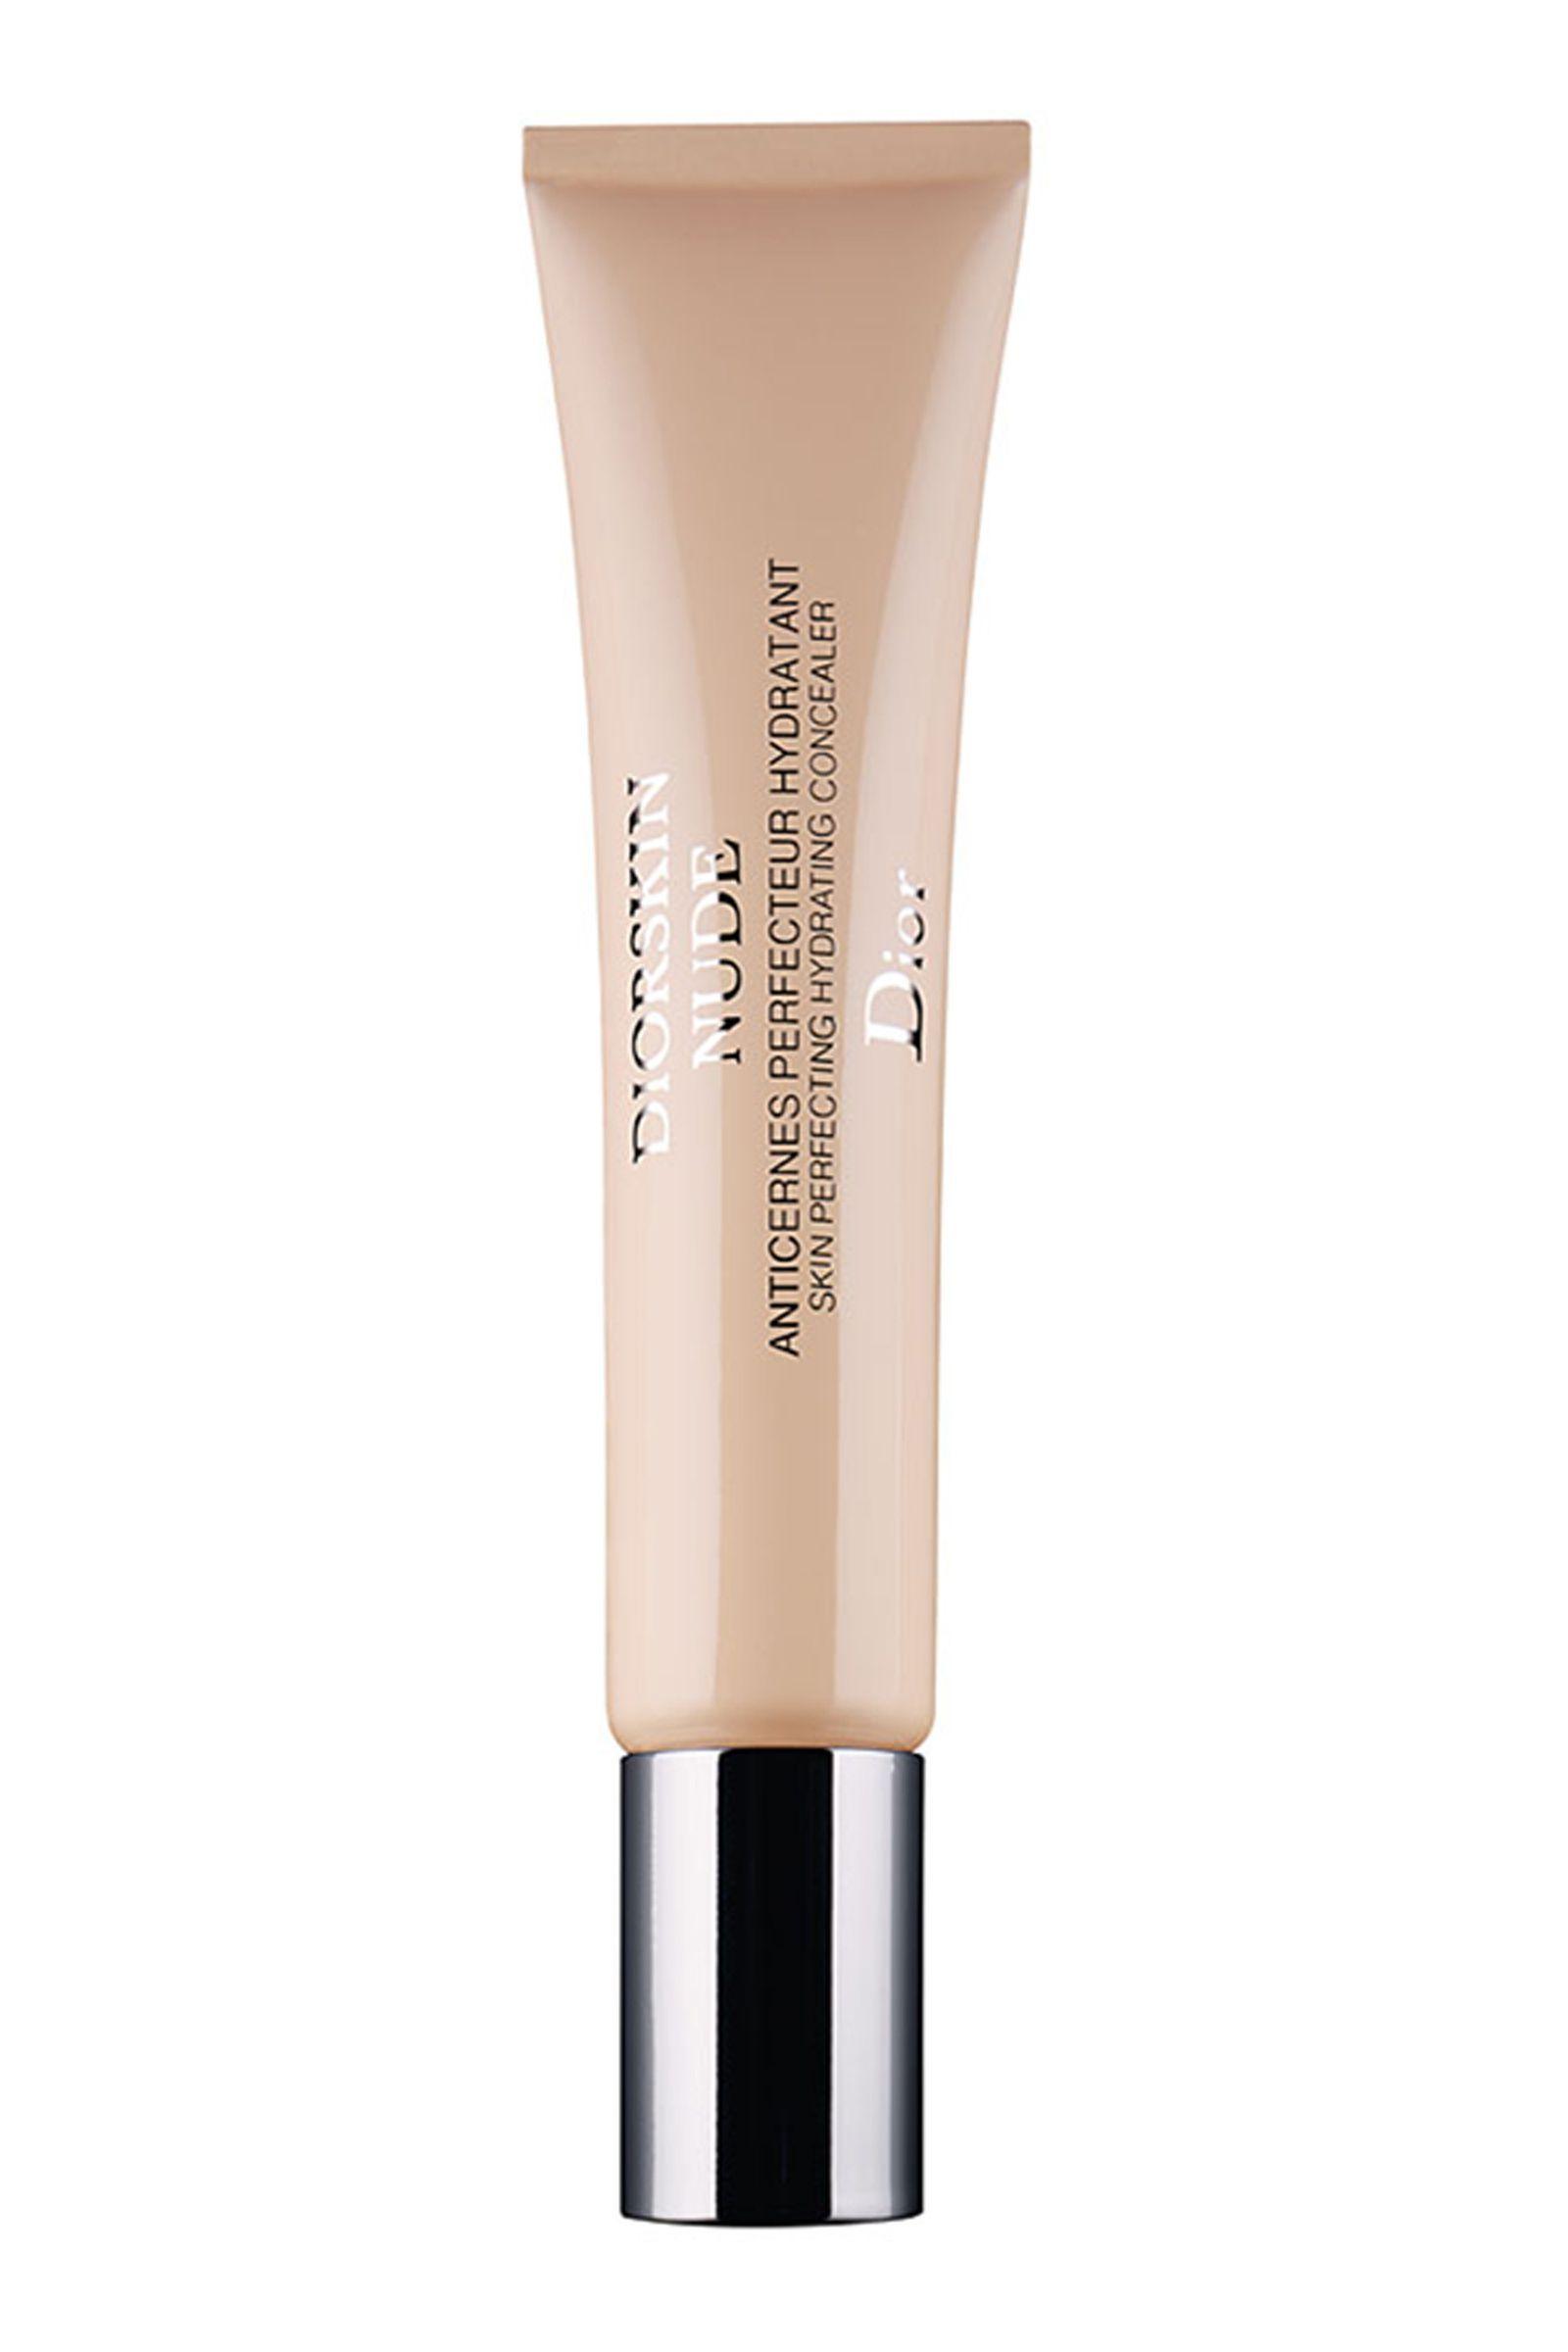 Dior - Diorskin Nude Skin Perfecting Hydrating Concealer